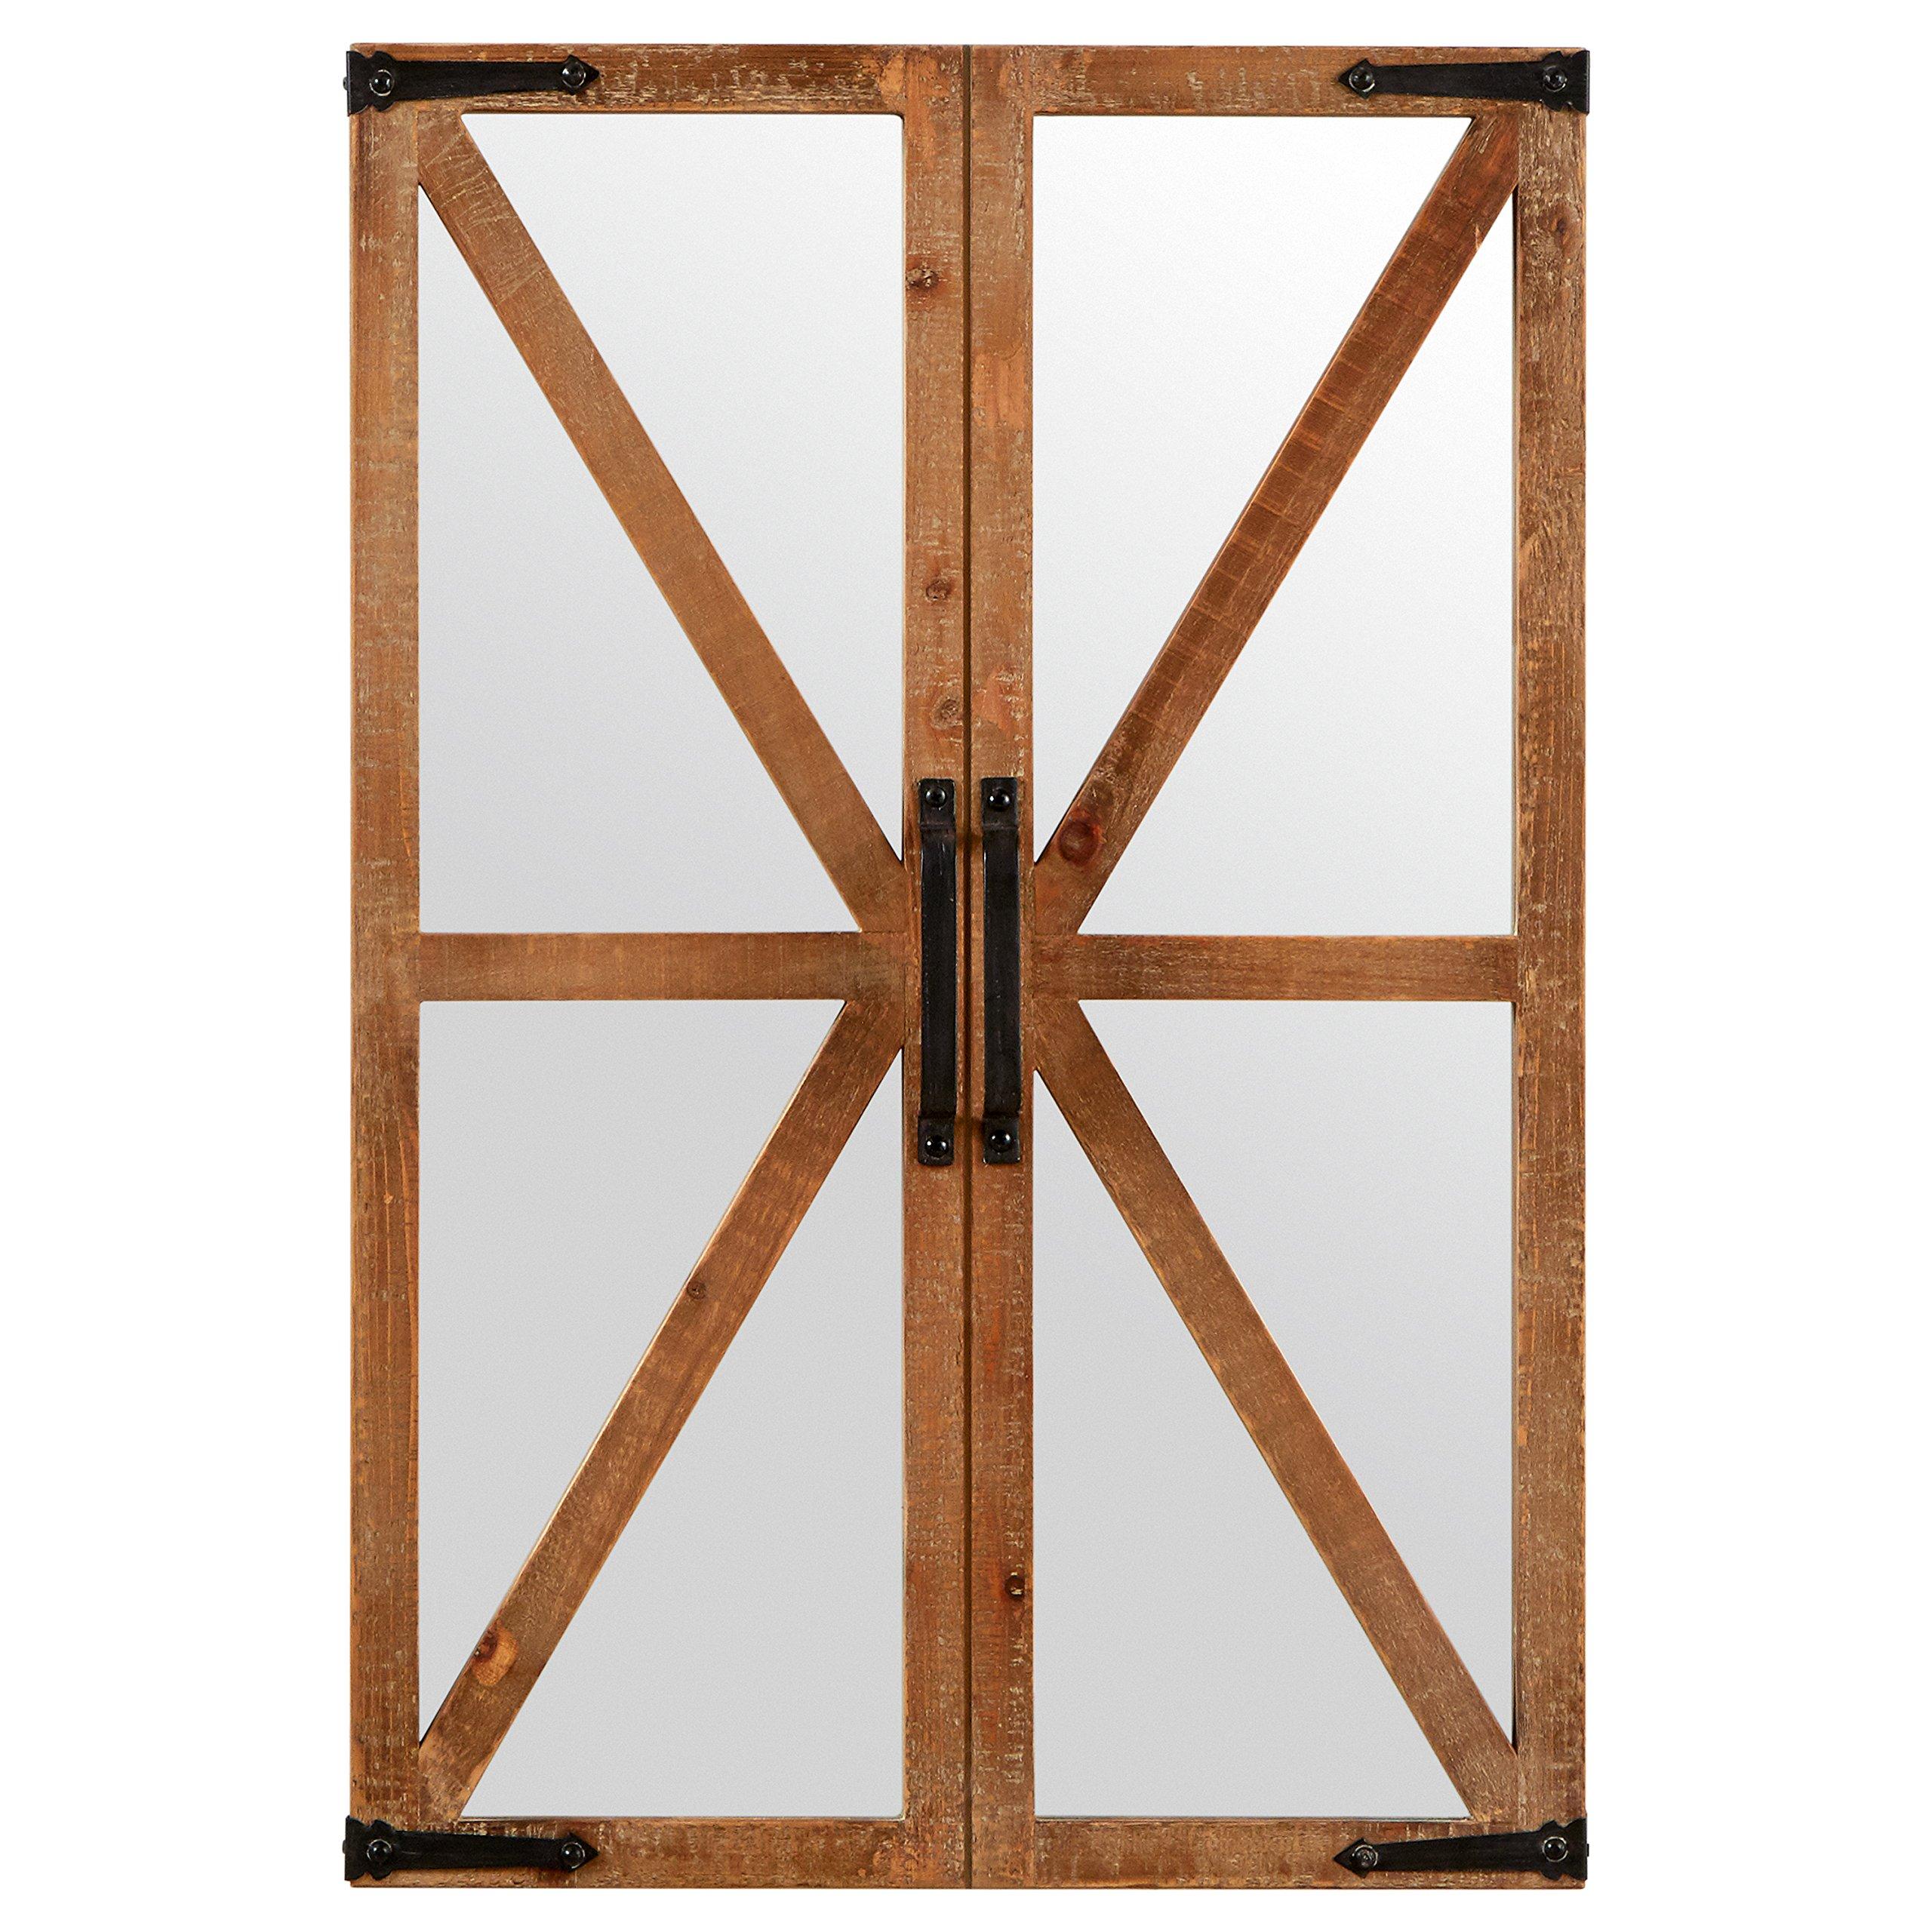 Stone & Beam Rustic Wood and Iron Barn Door Mirror, 30''H, Natural